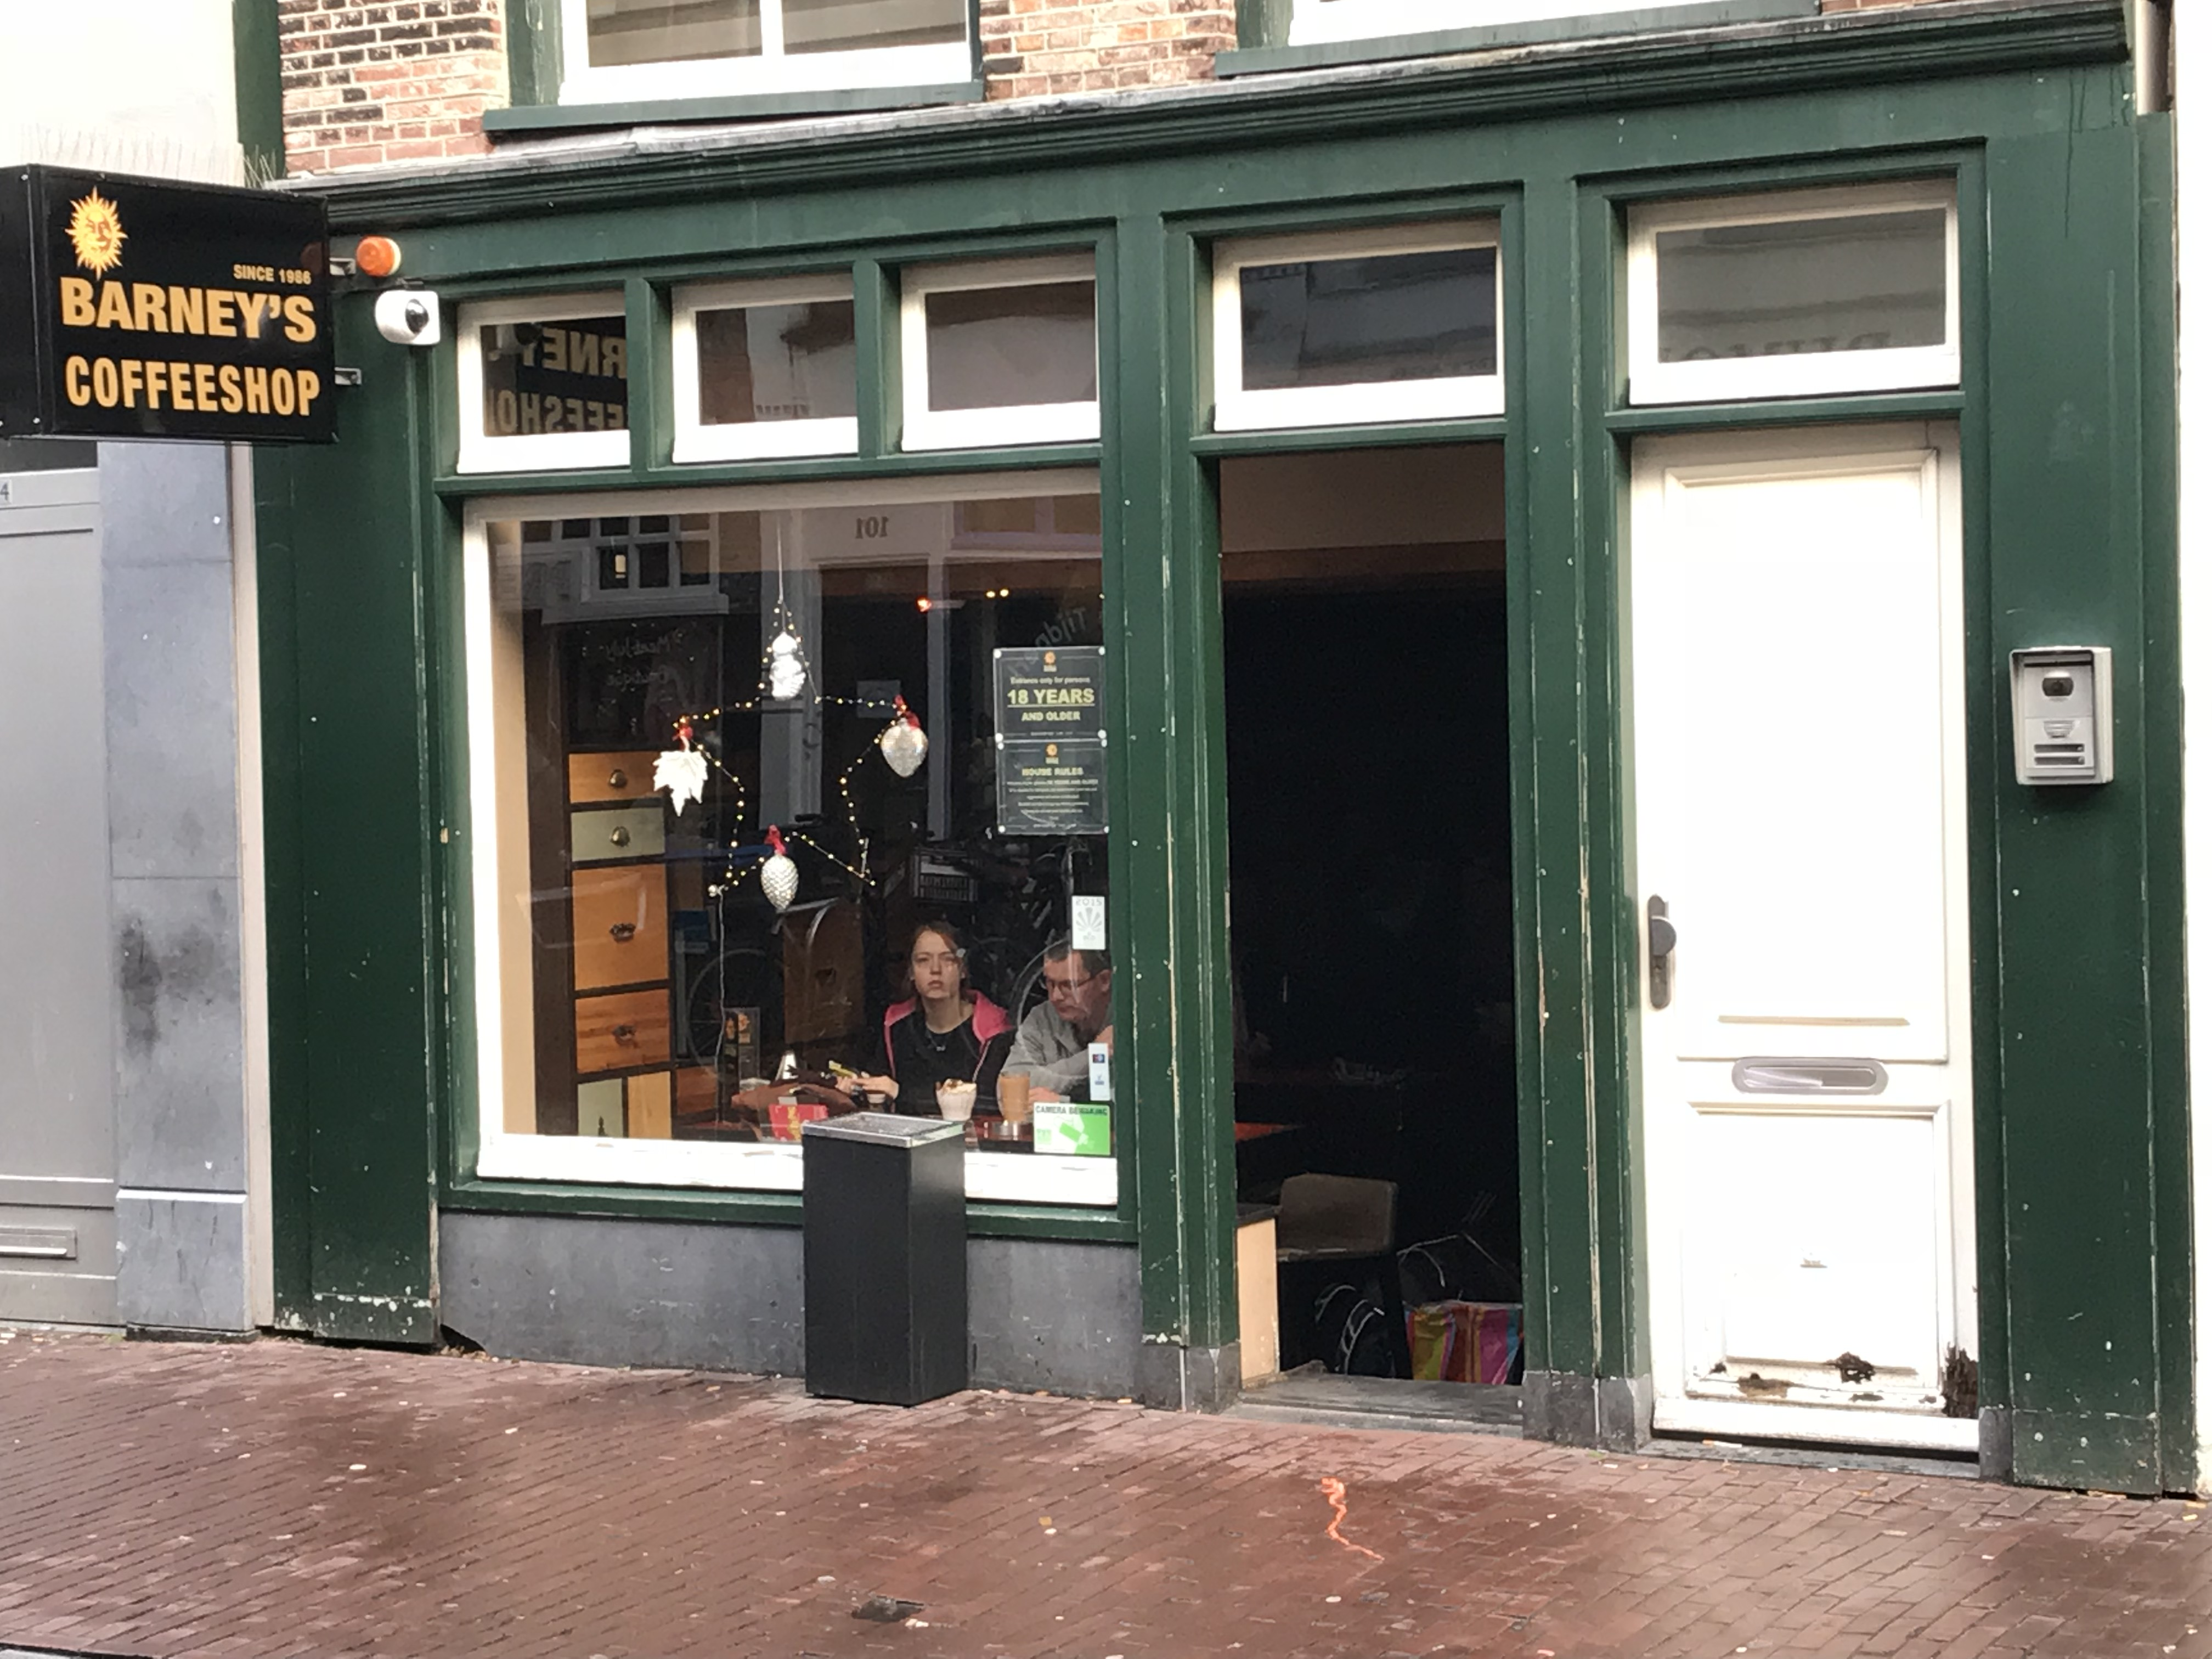 barney's Amsterdam